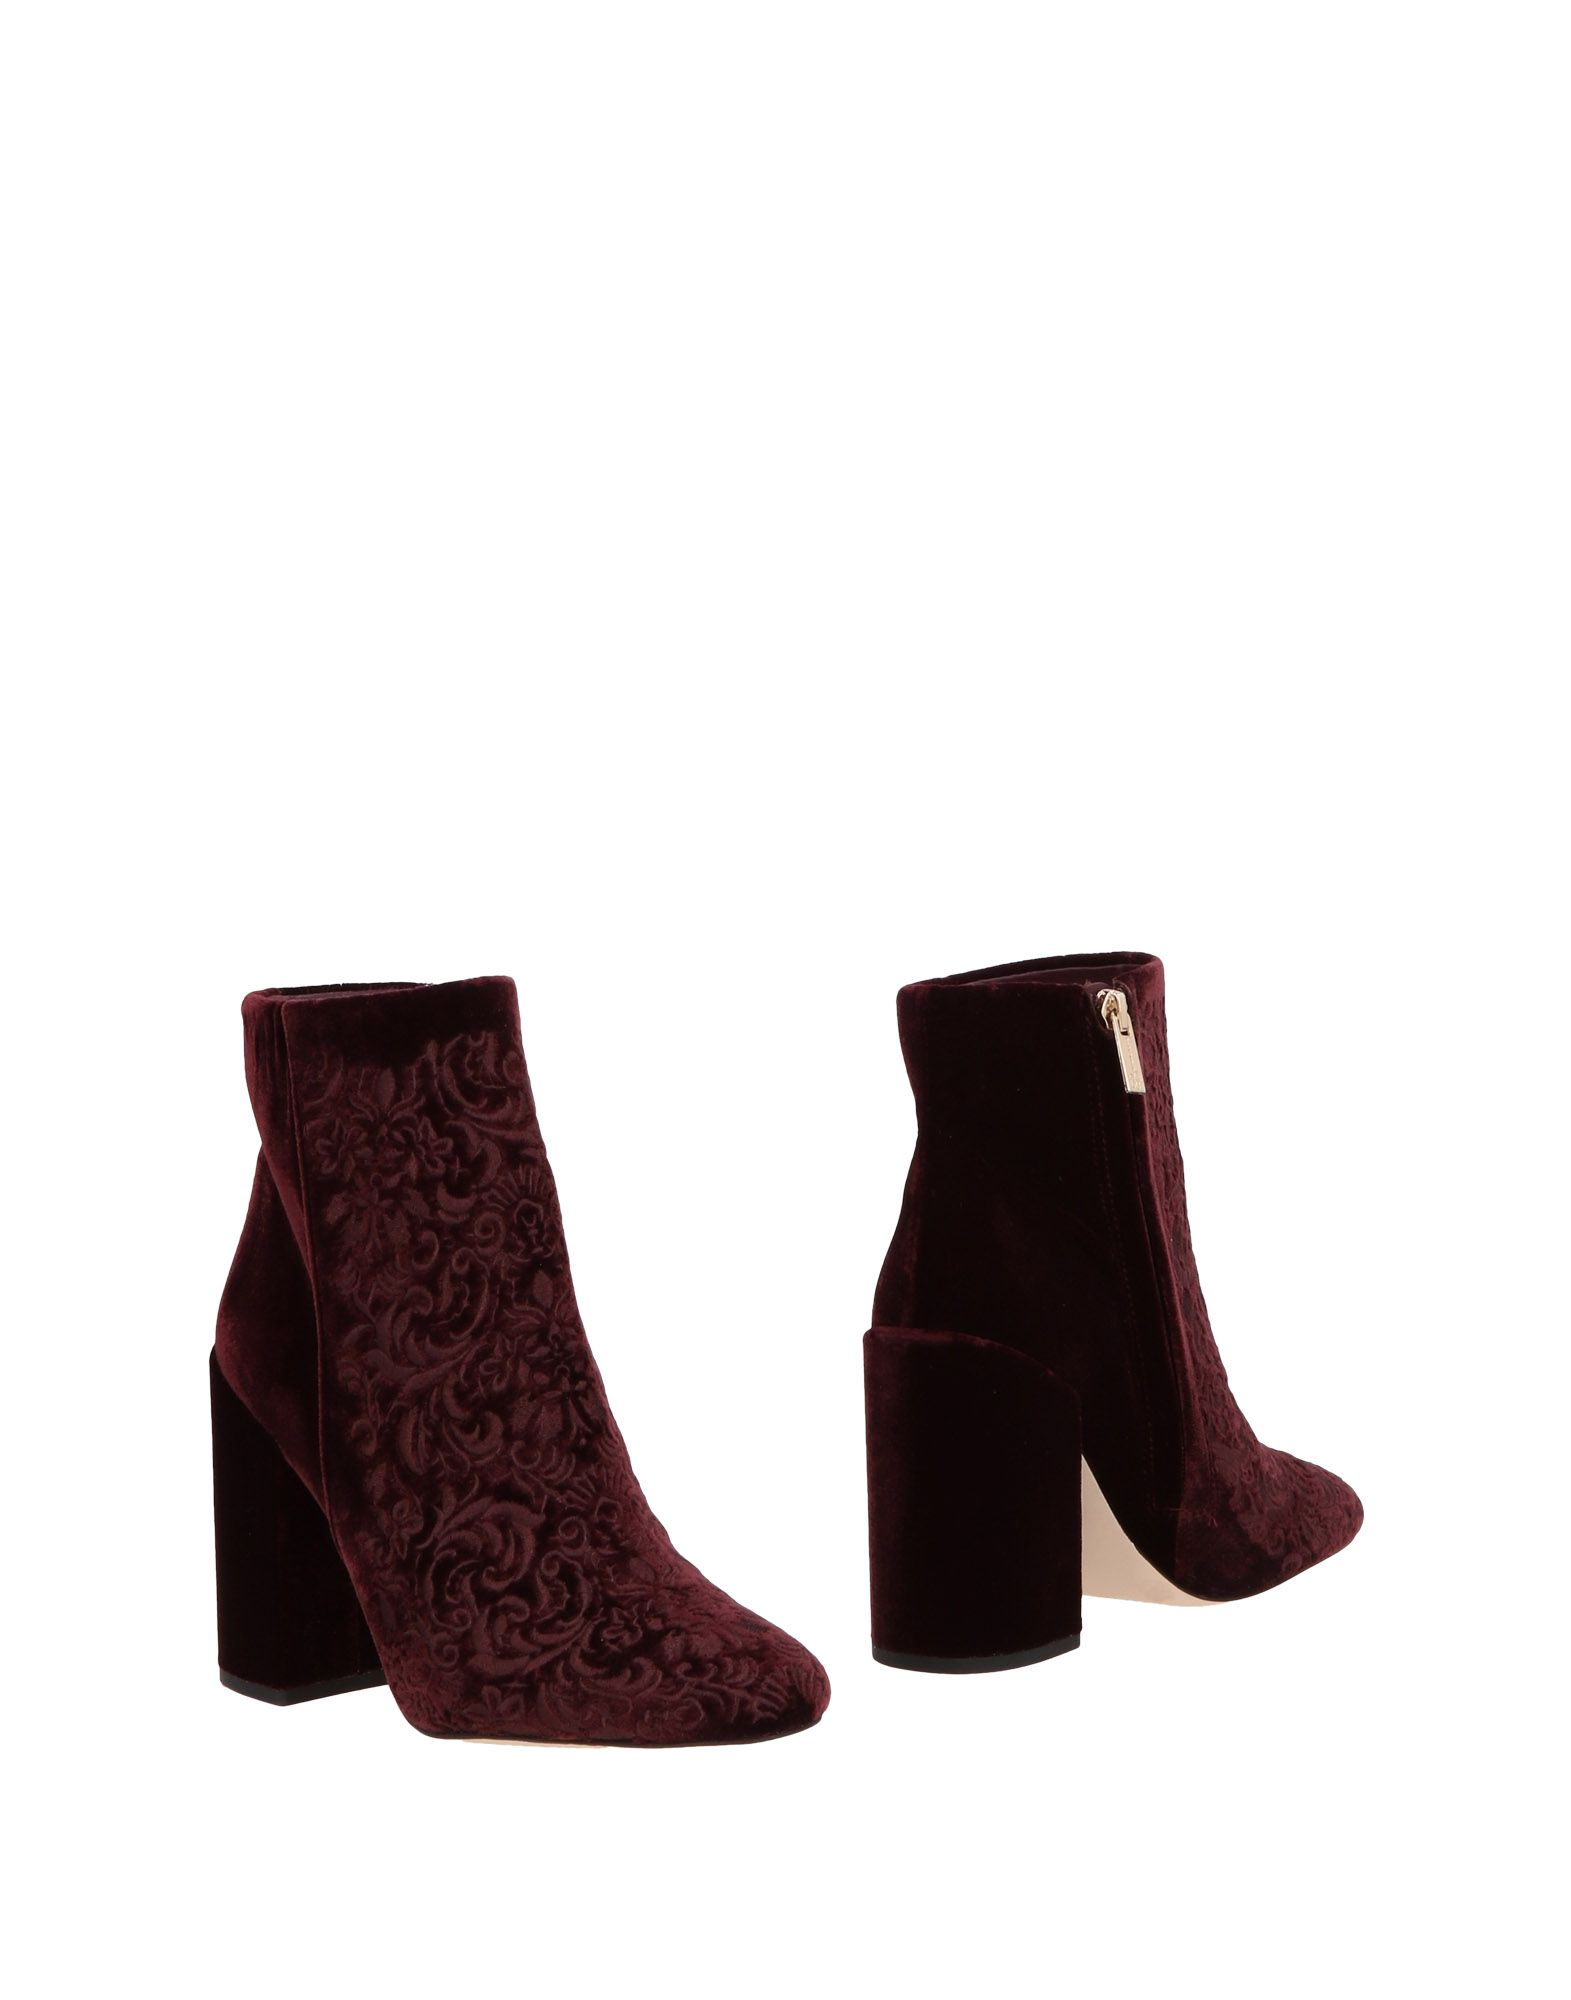 JESSICA SIMPSON Полусапоги и высокие ботинки jessica simpson полусапоги и высокие ботинки